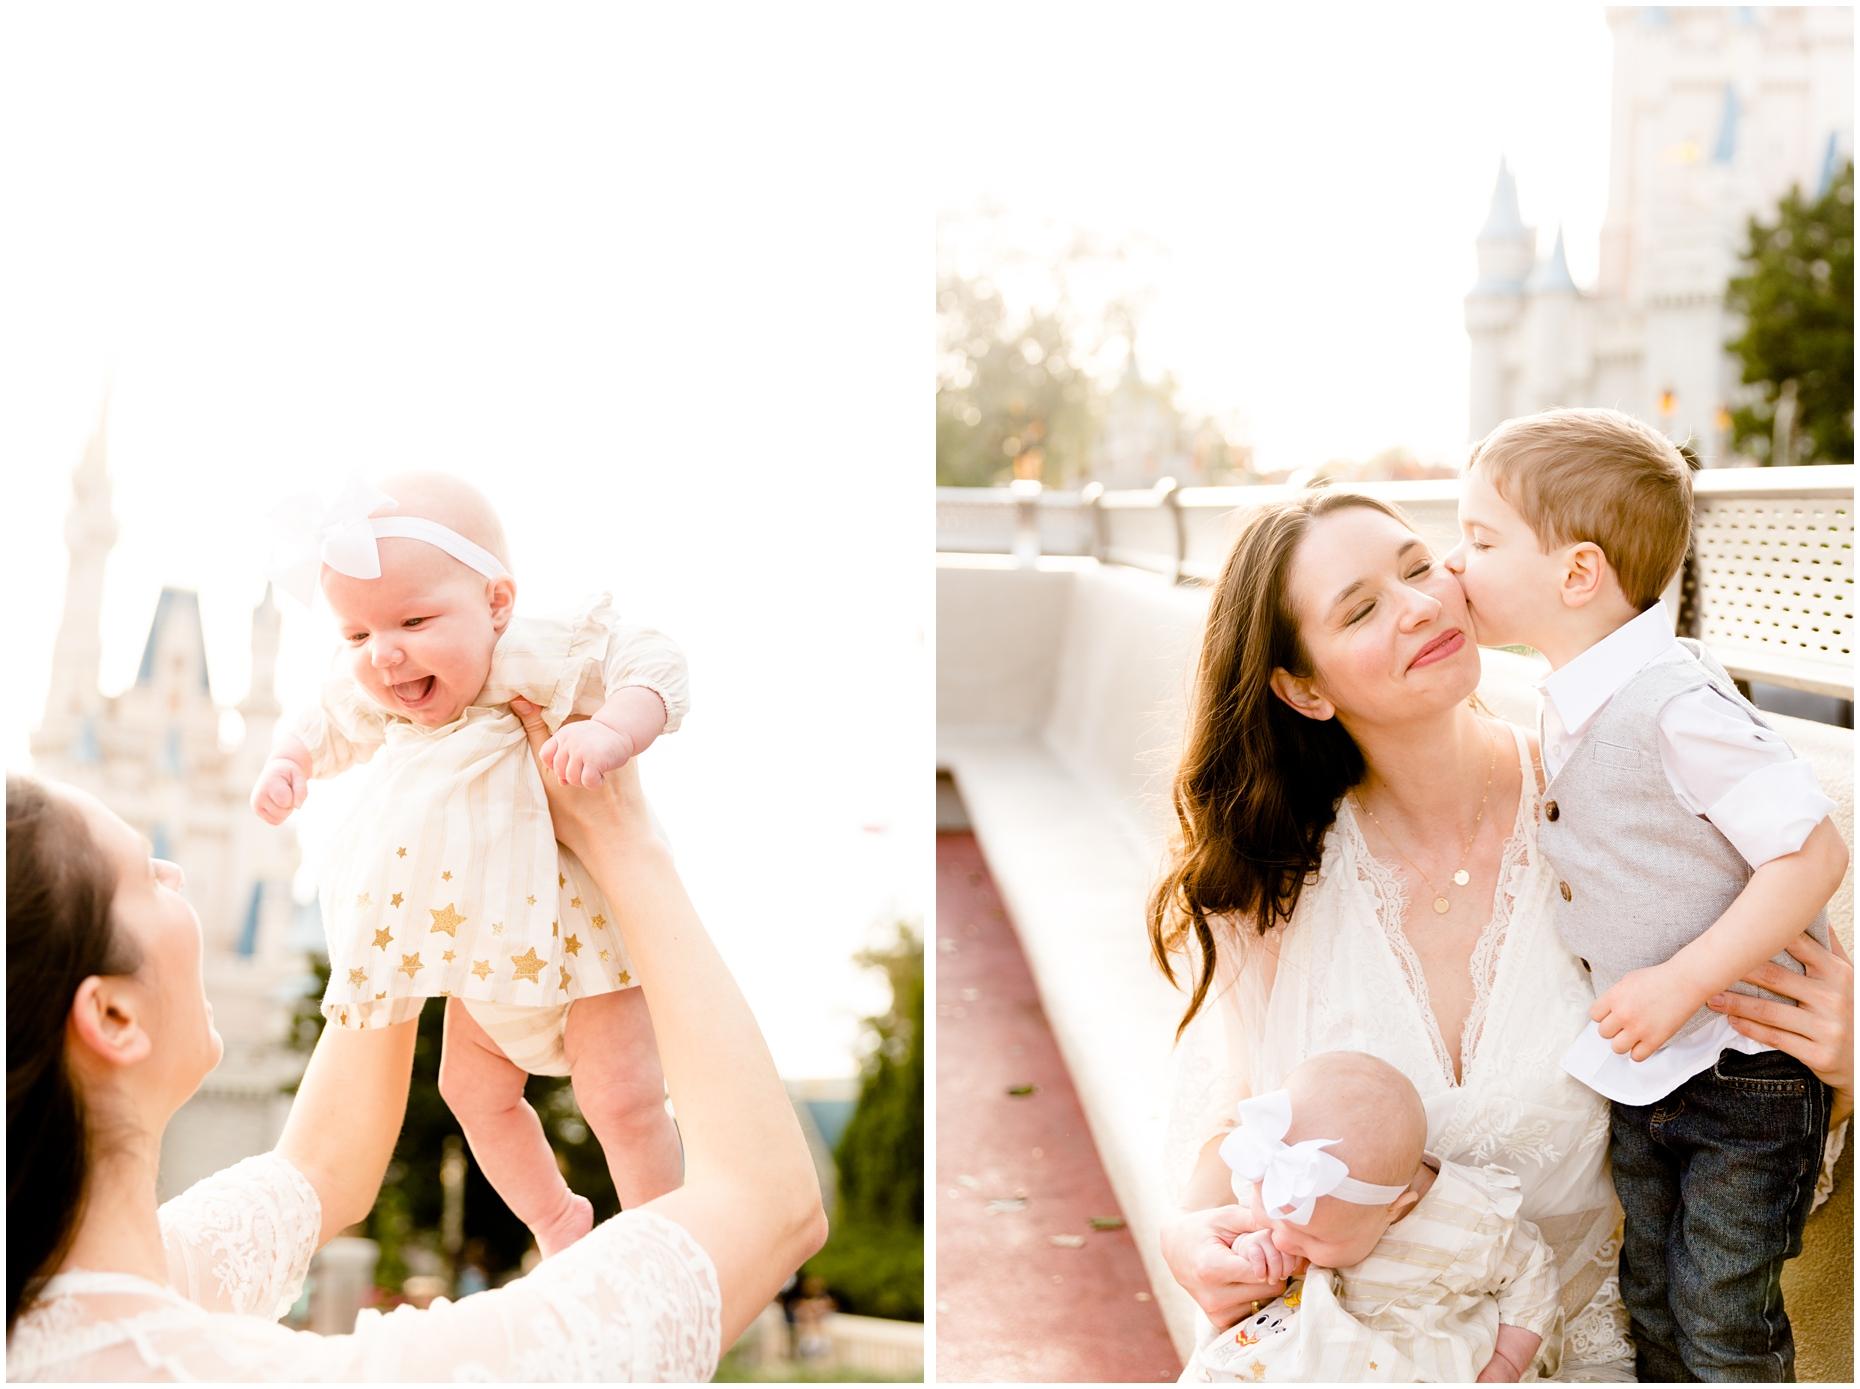 Morrow_Magic_Kingdom_Disney_World_Family_Photographer